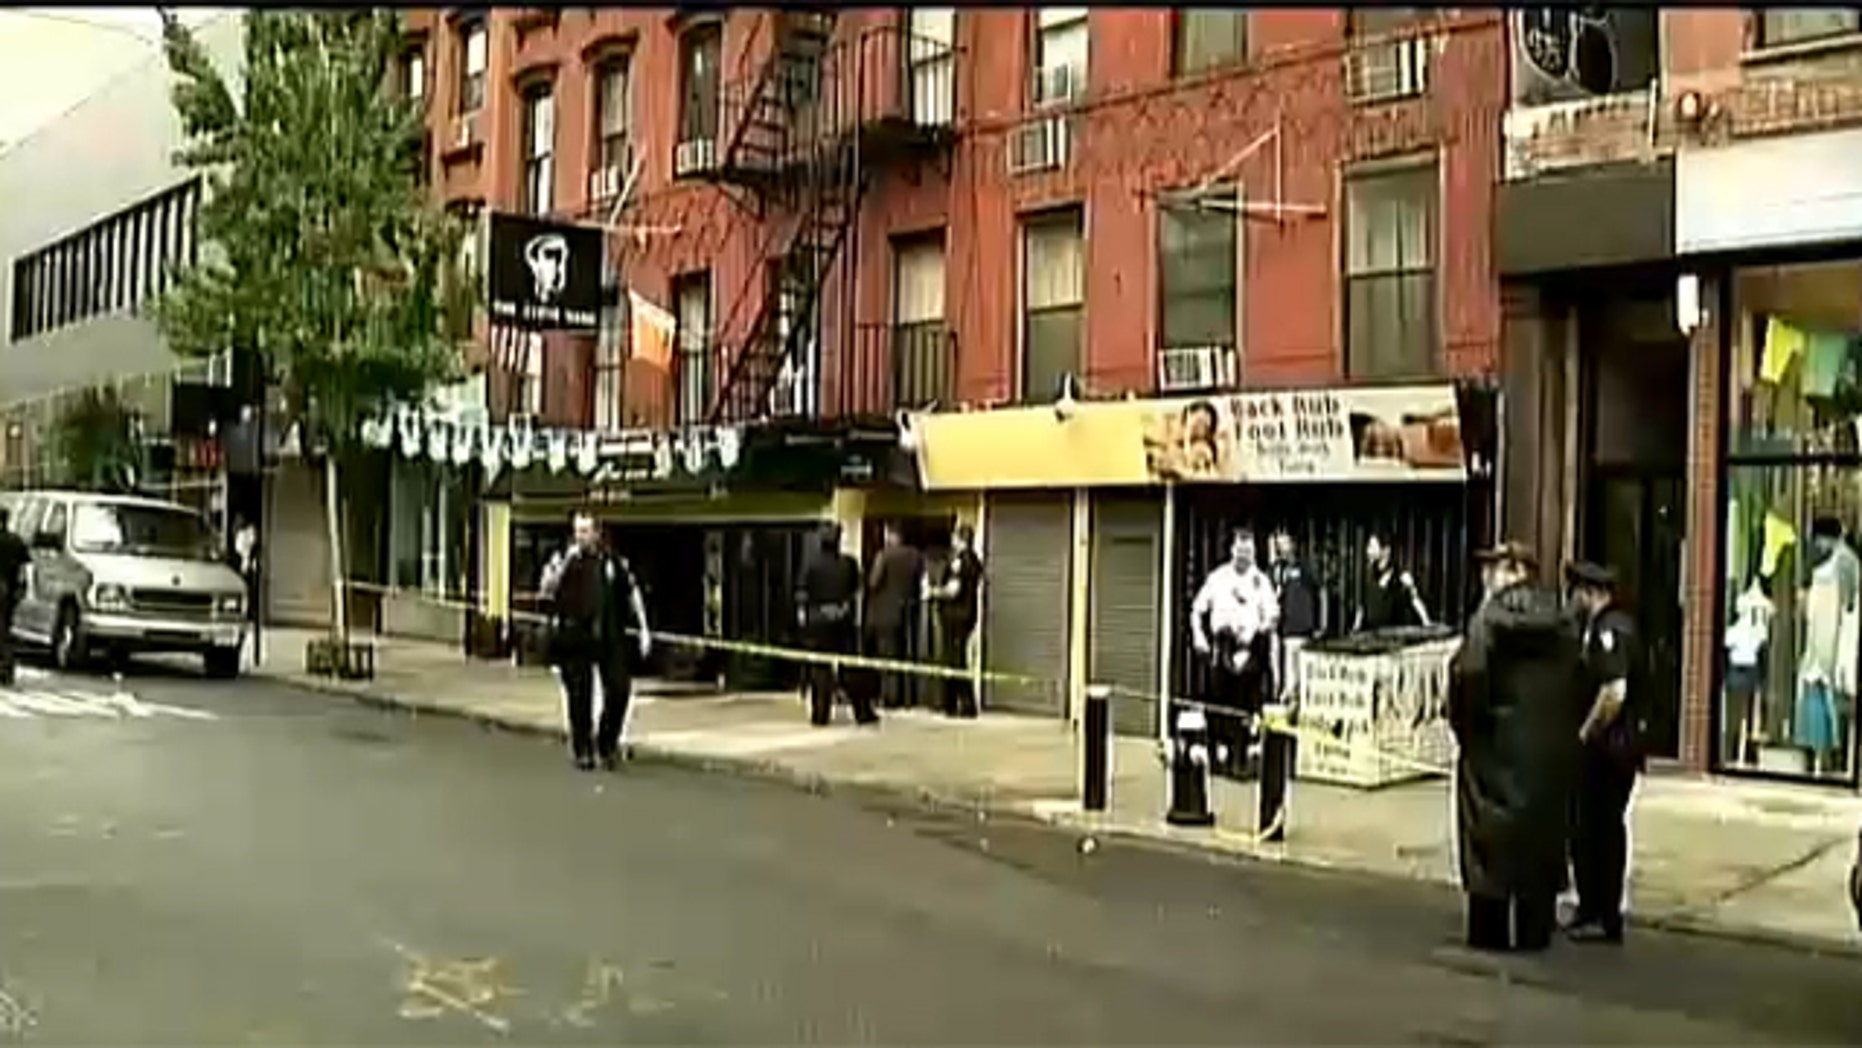 Aug. 27, 2012: Investigators work outside apartment building where woman found dead.